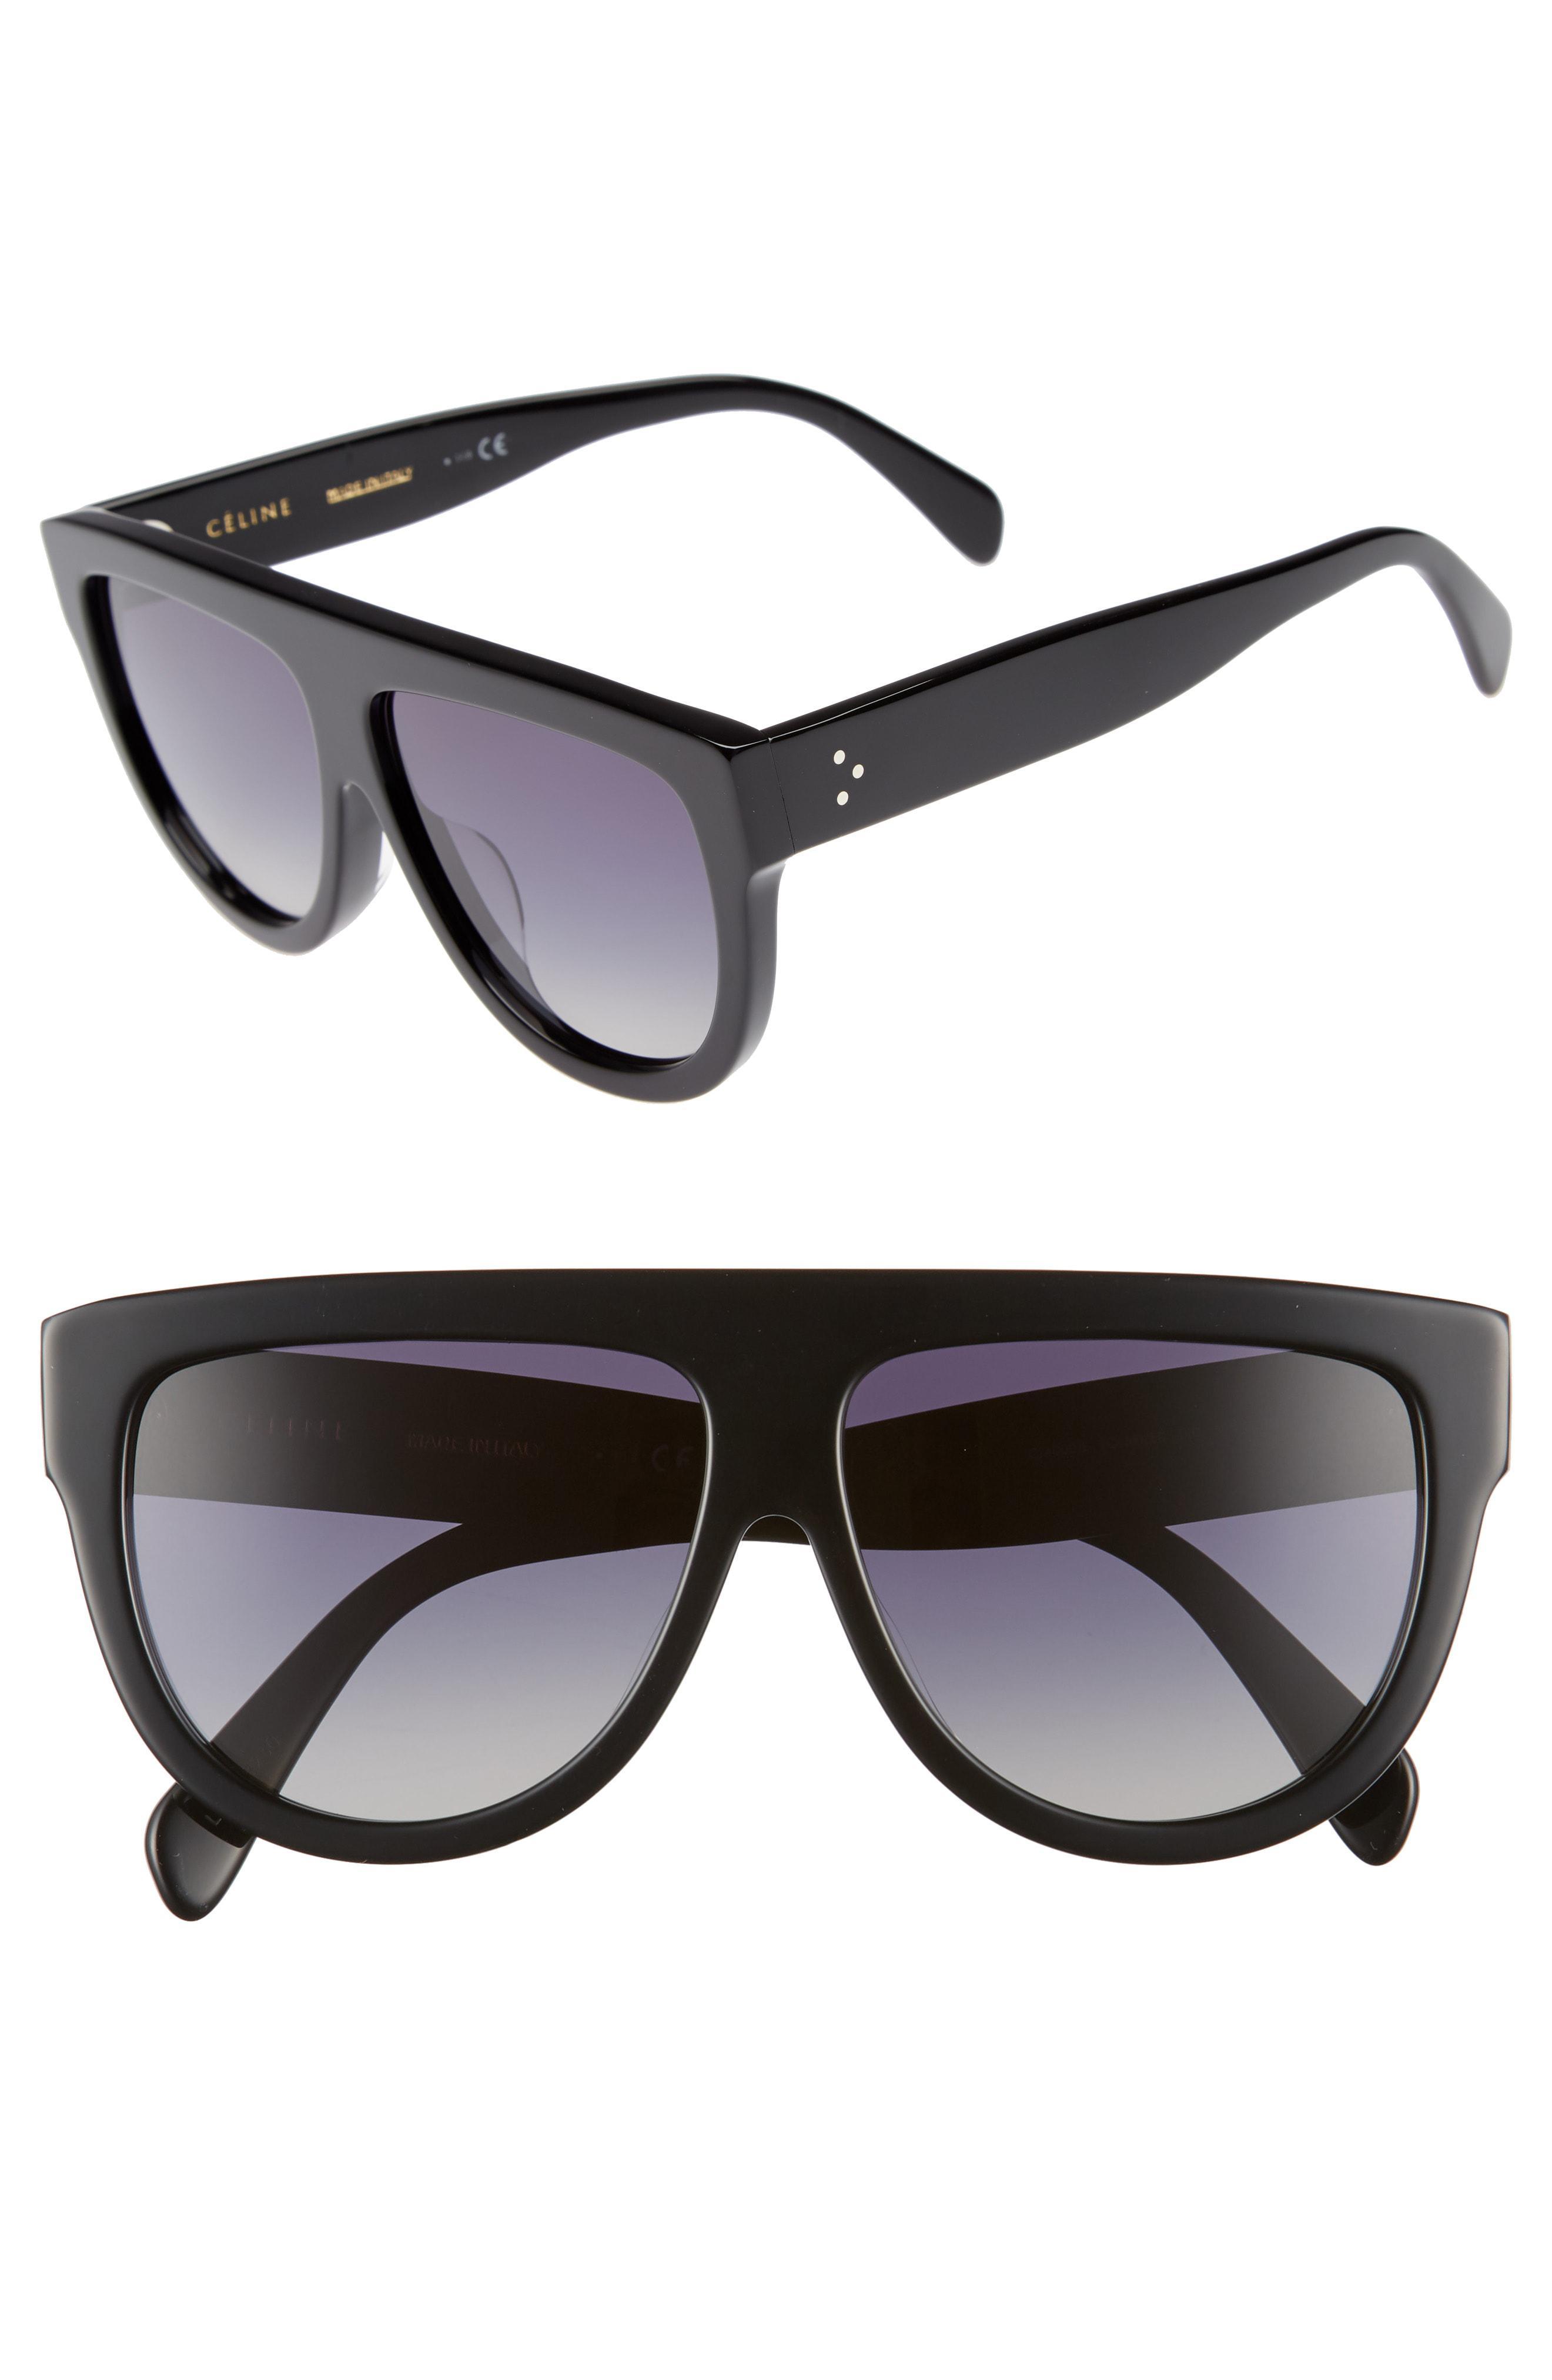 5a0309751ce Céline - Black Special Fit 60mm Polarized Gradient Flat Top Sunglasses - -  Lyst. View fullscreen